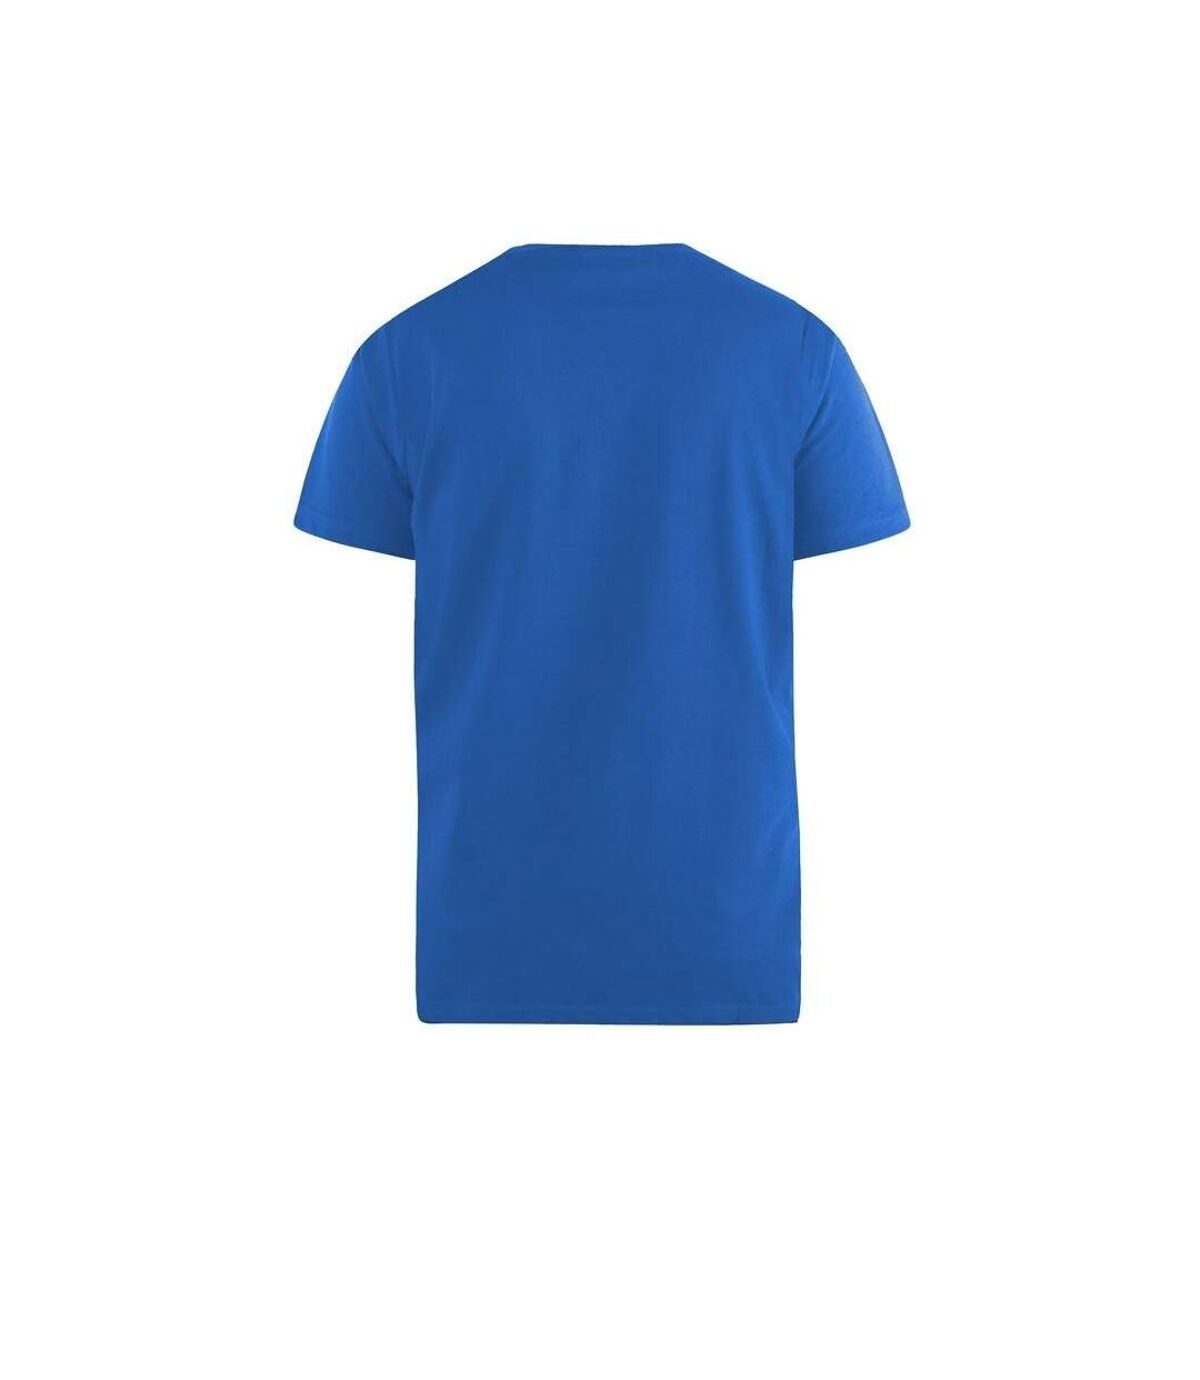 Duke Mens Signature-2 V-Neck T-Shirt (Blue) - UTDC167